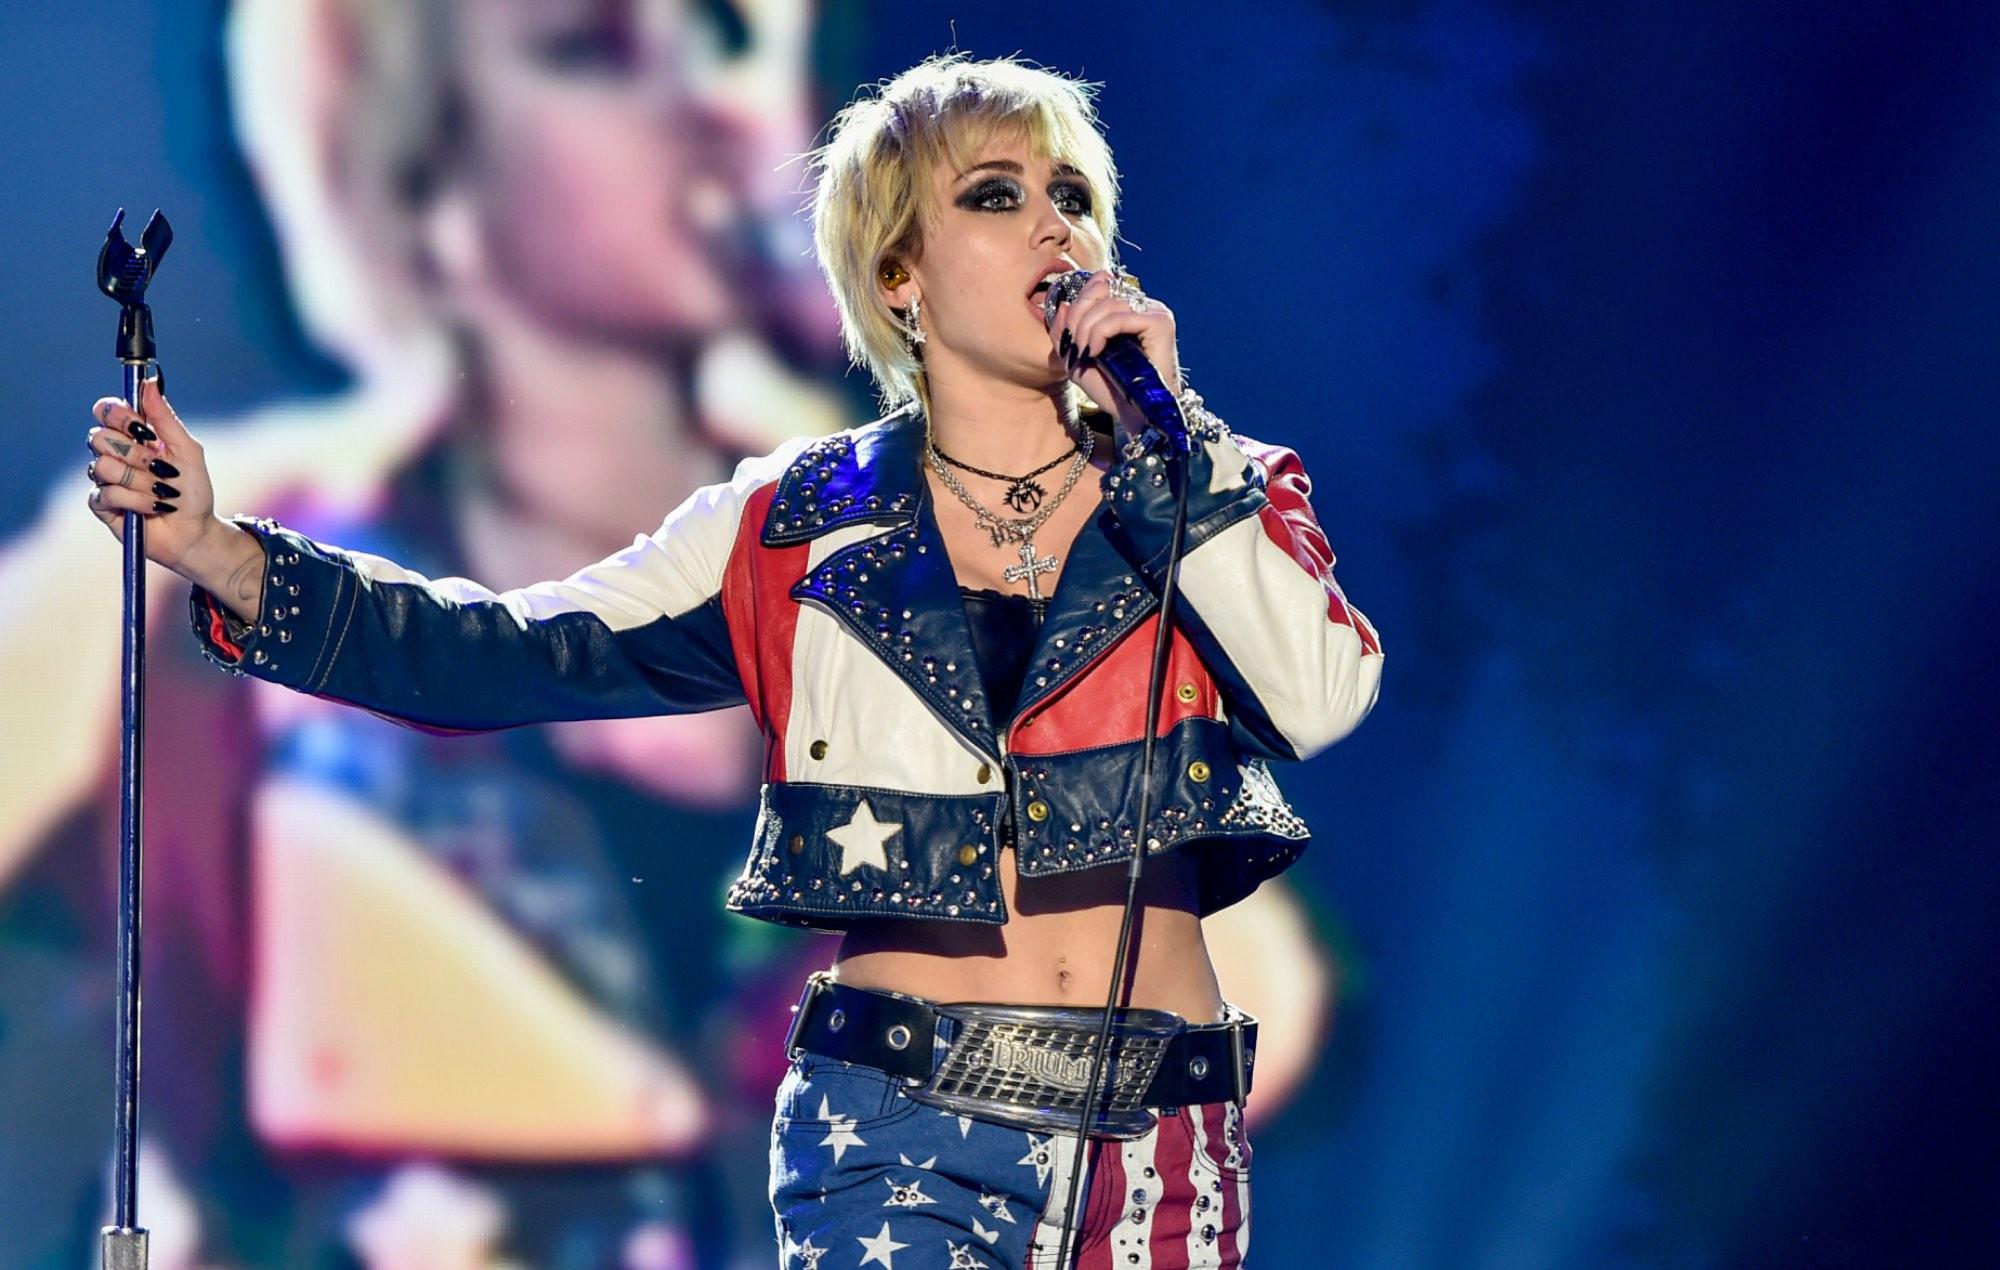 Miley Cyrus pens heartfelt letter to Hannah Montana to mark show's 15th anniversary